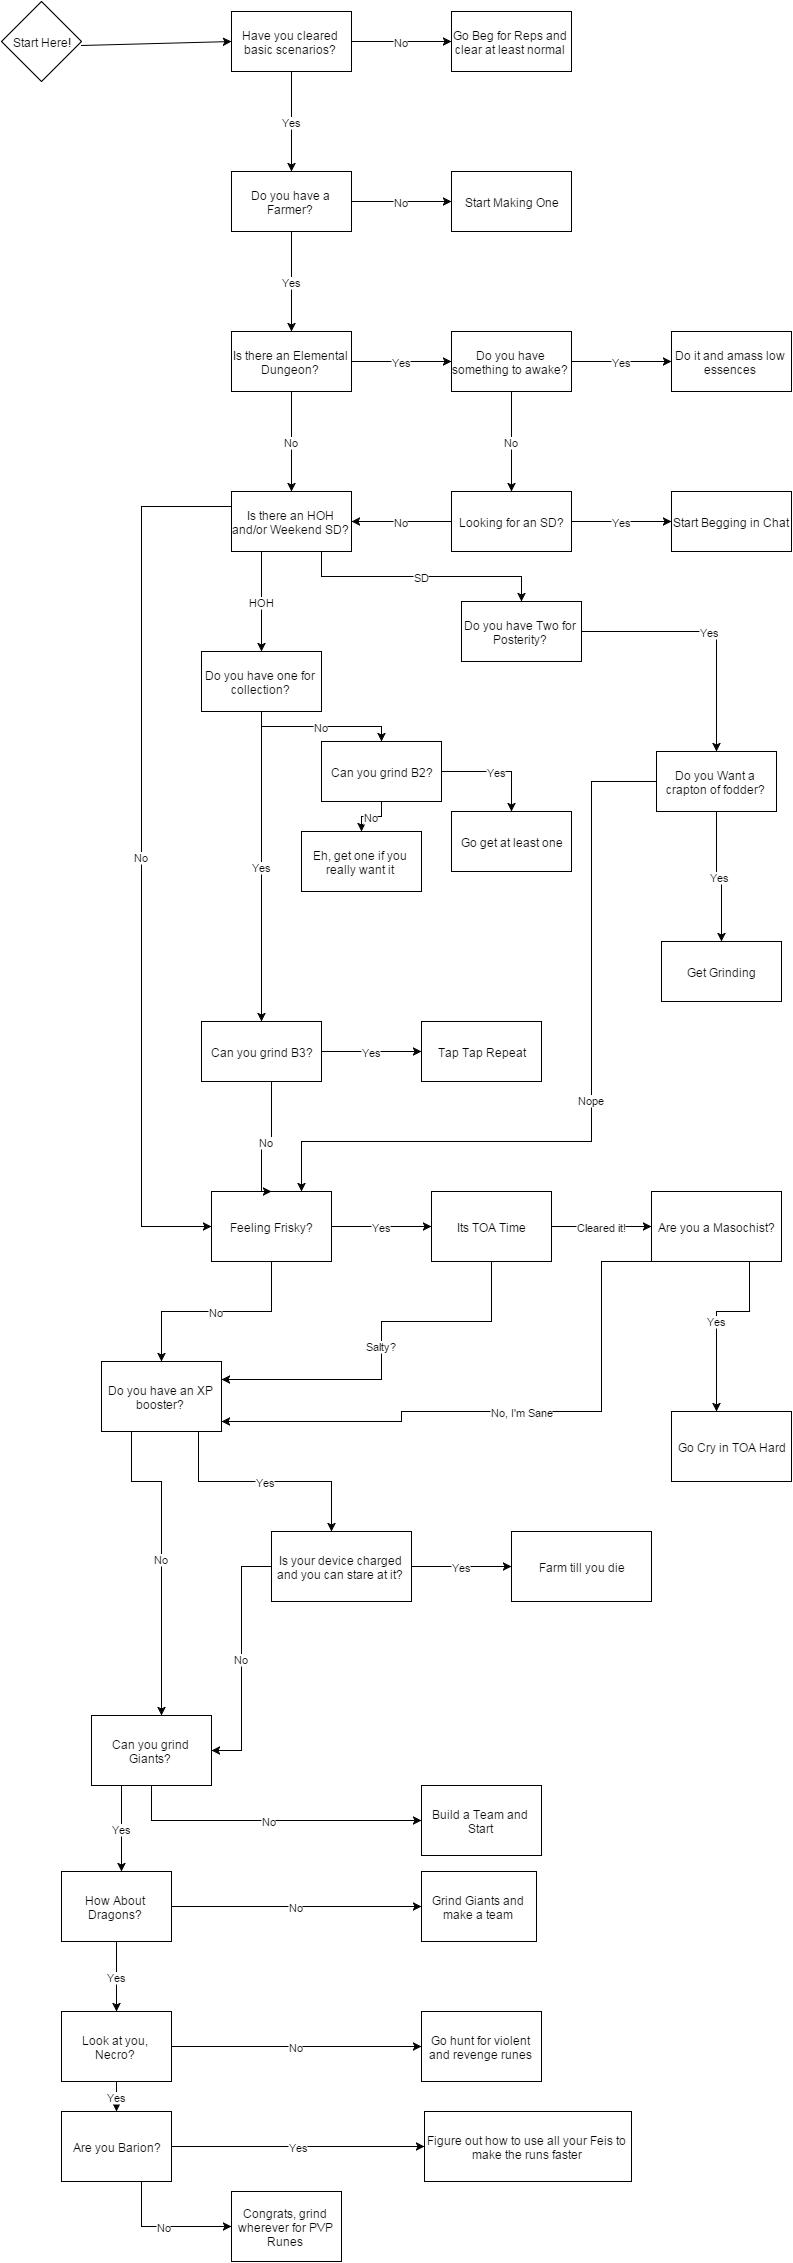 Decision in Summoners War